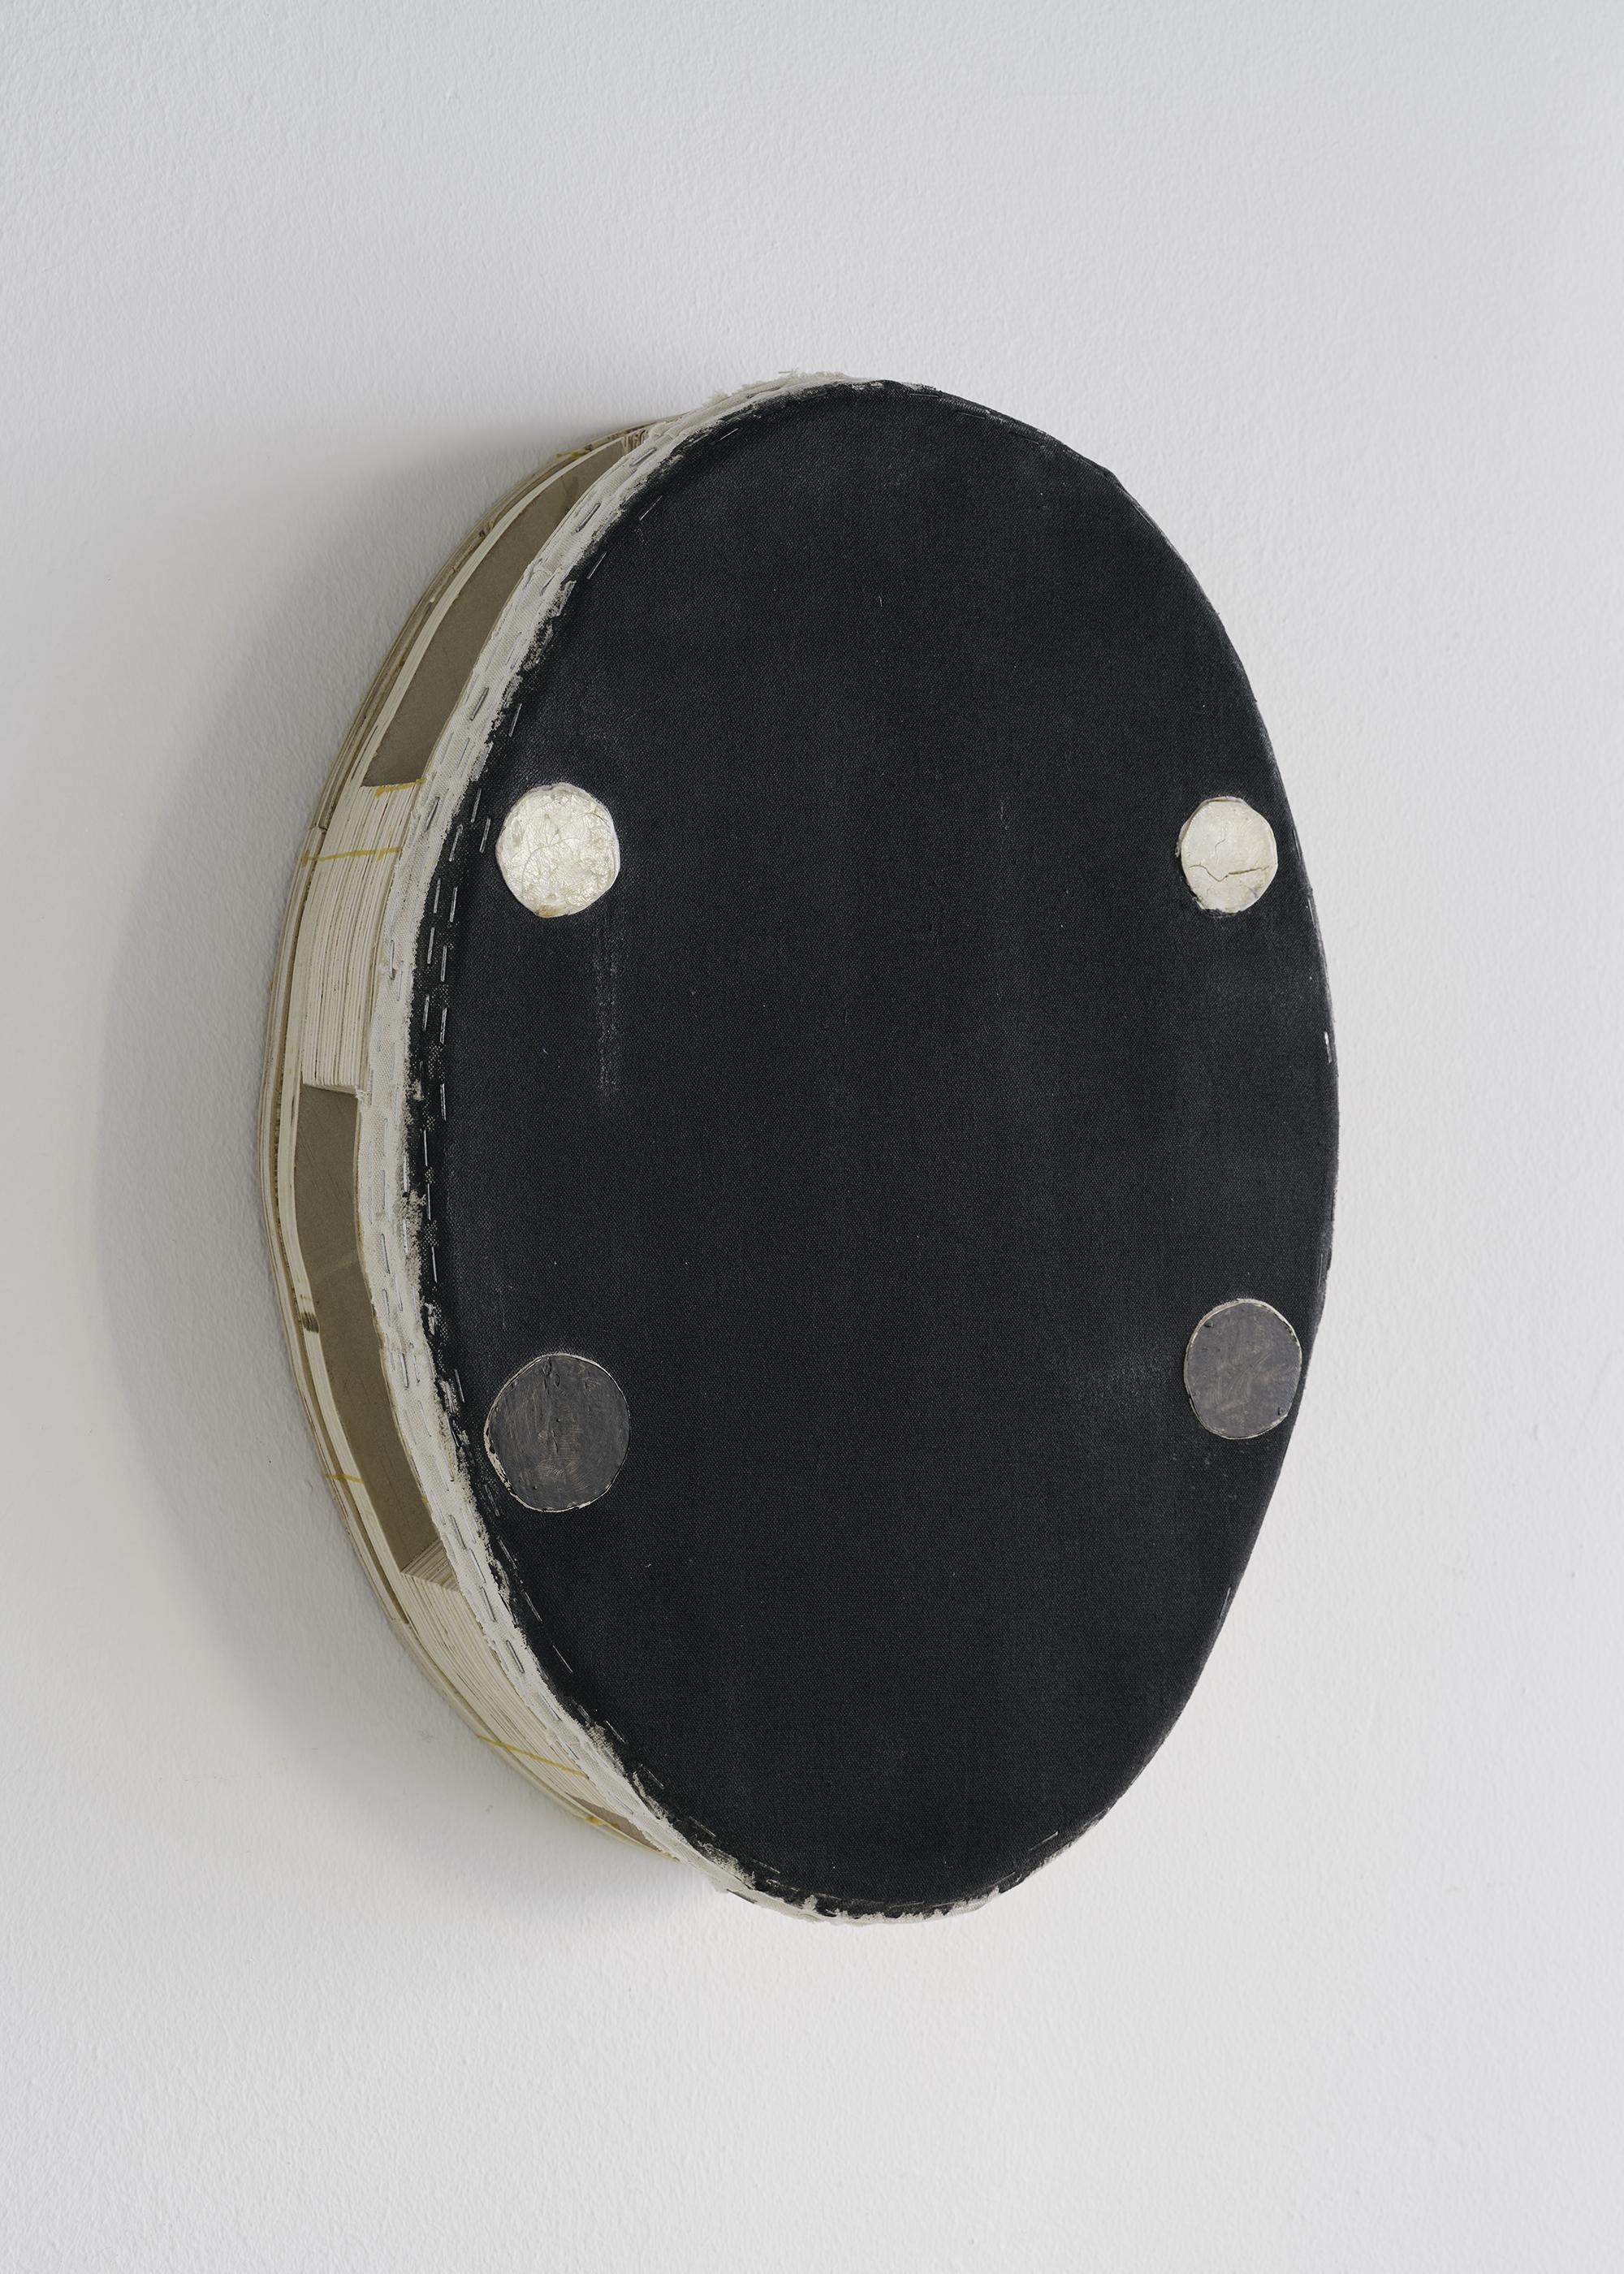 4 Otis Jones - 2021 - Acrylic on linen on wood 53 CM x 37,5 CM x 13.5 CM